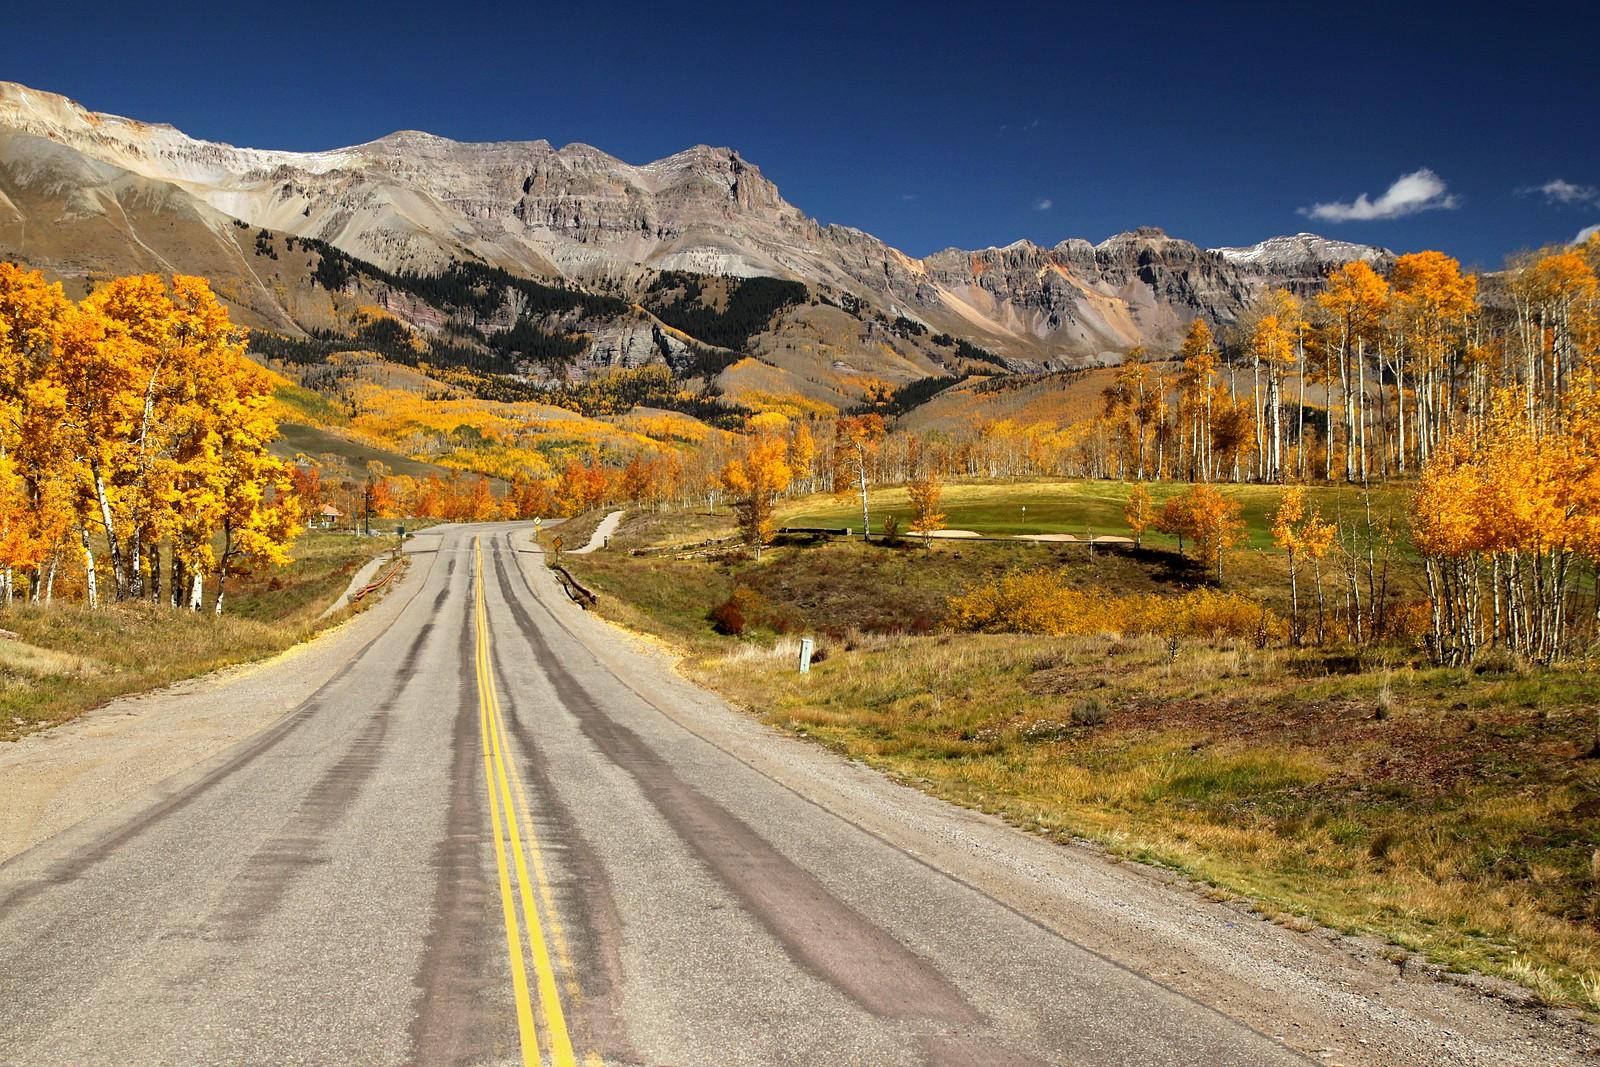 Driving into Telluride